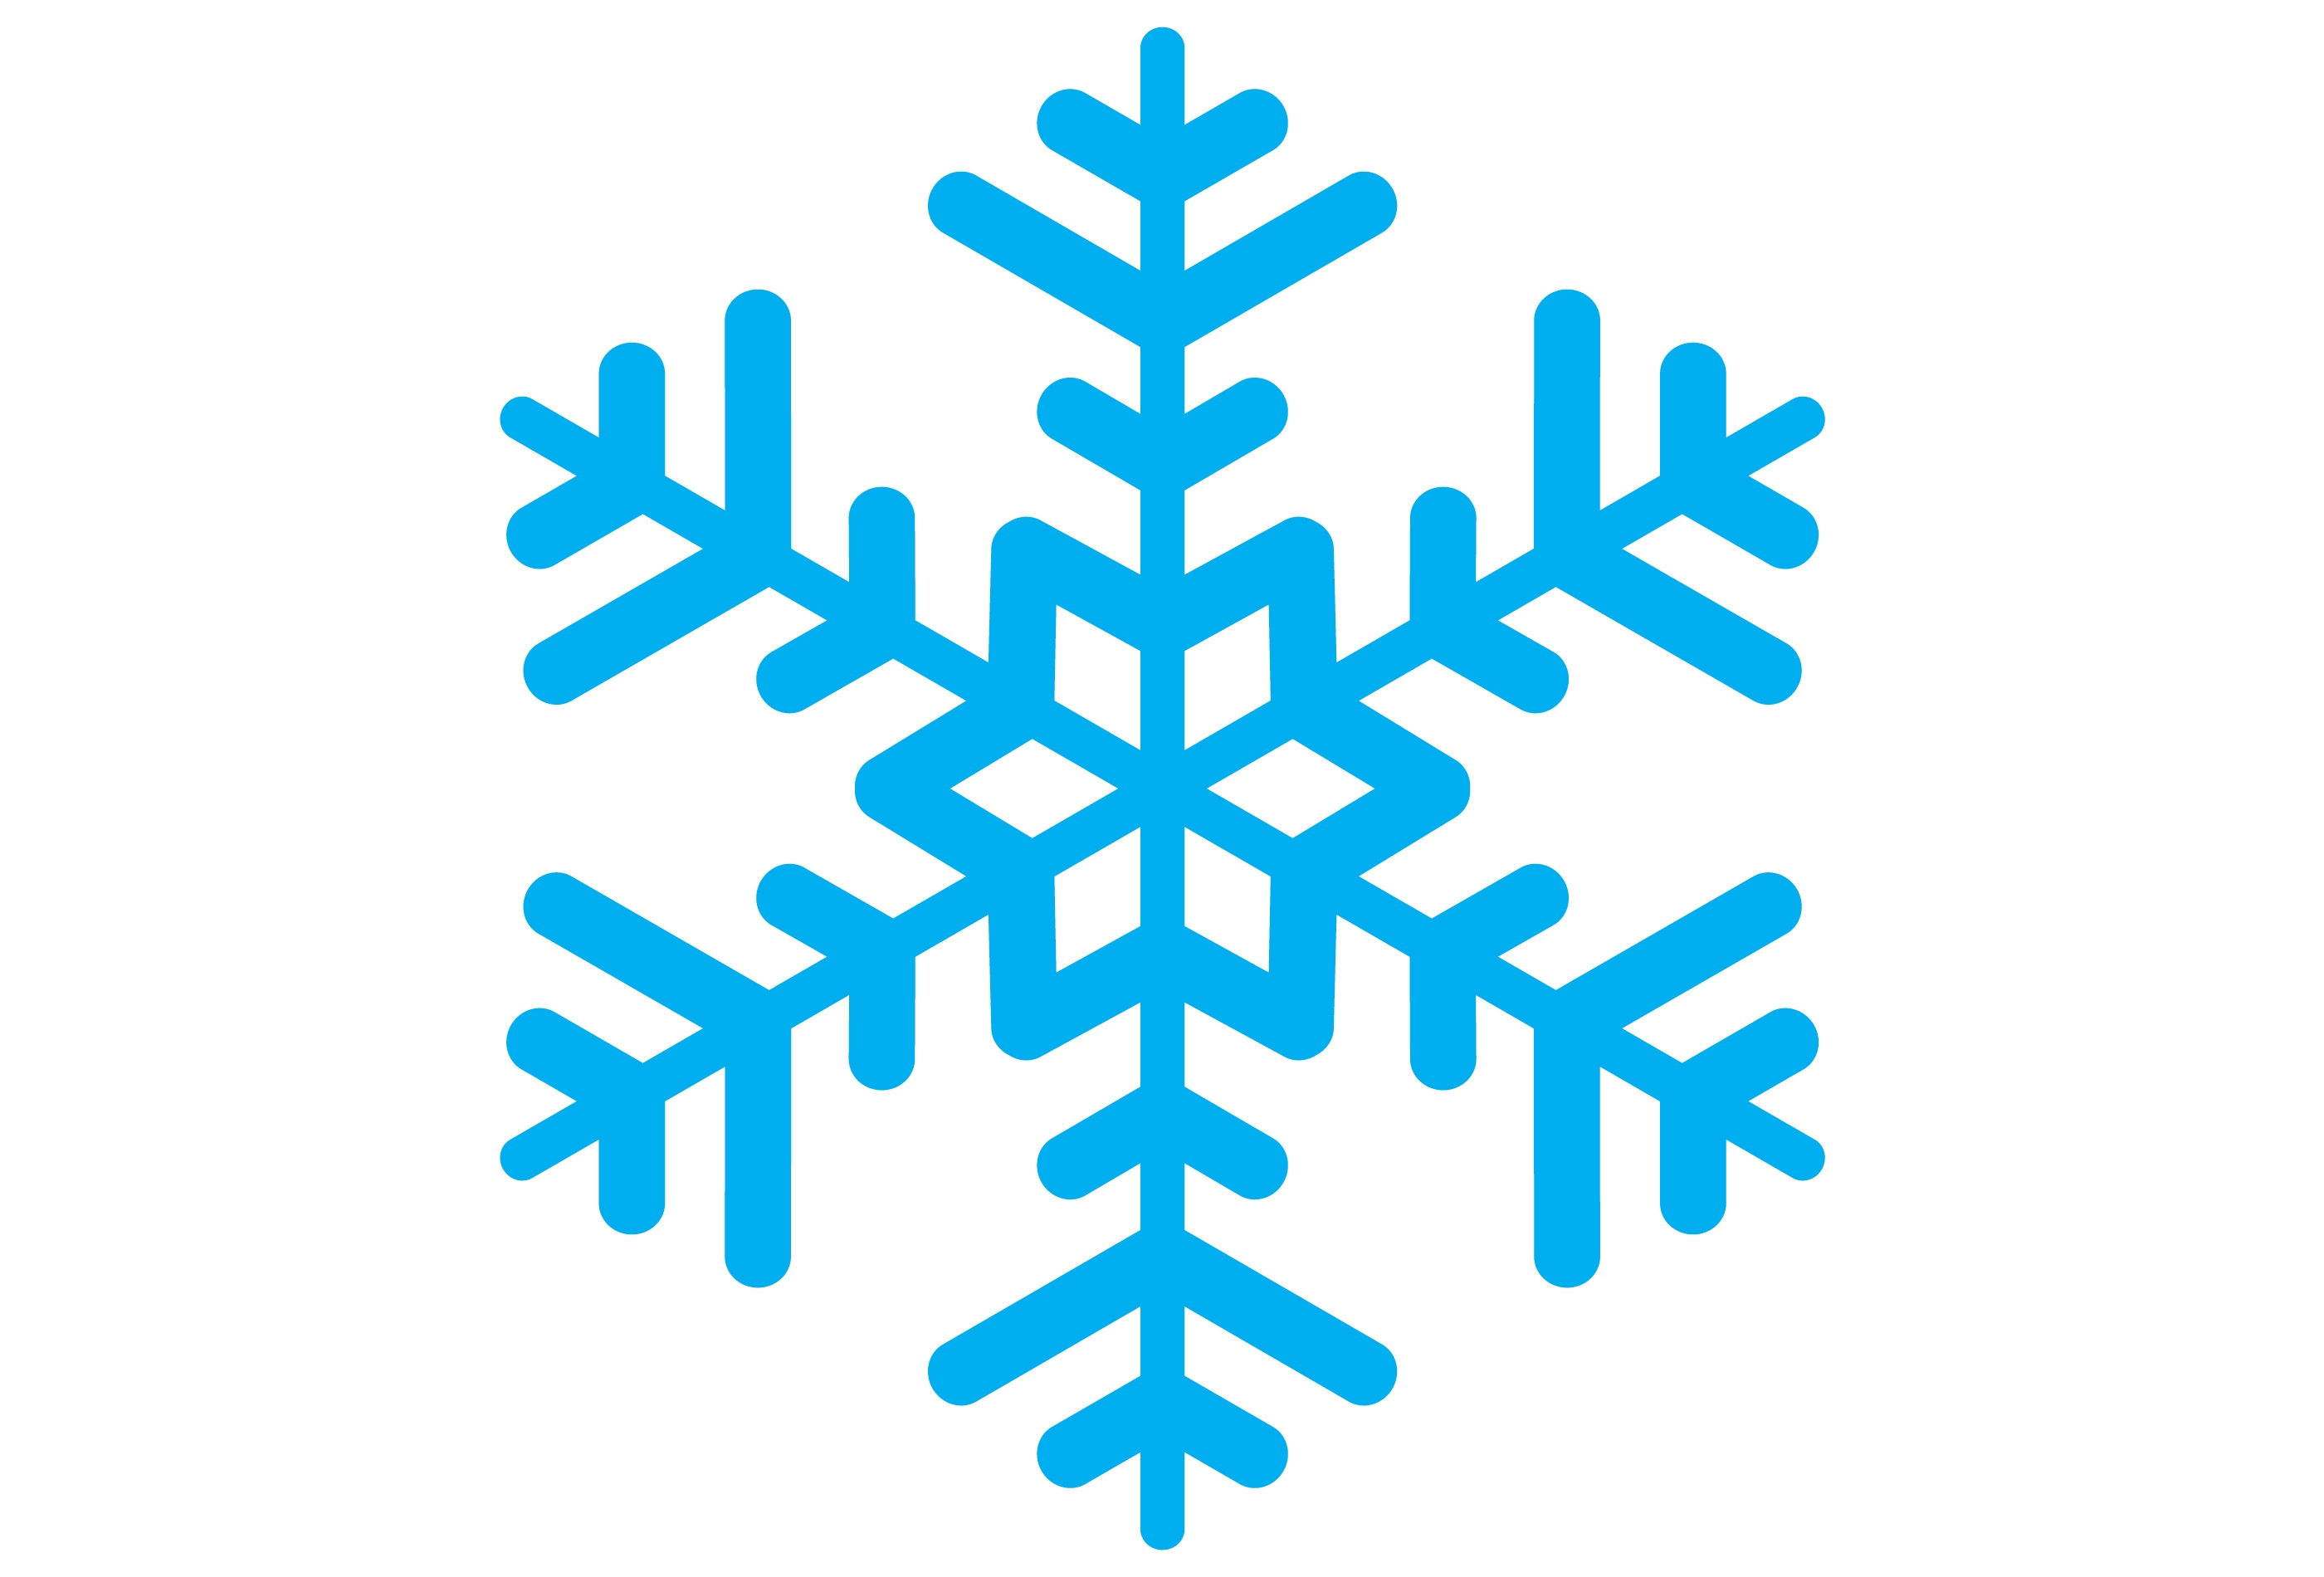 2800x1900 Snowflake Clipart Simple Snowflake